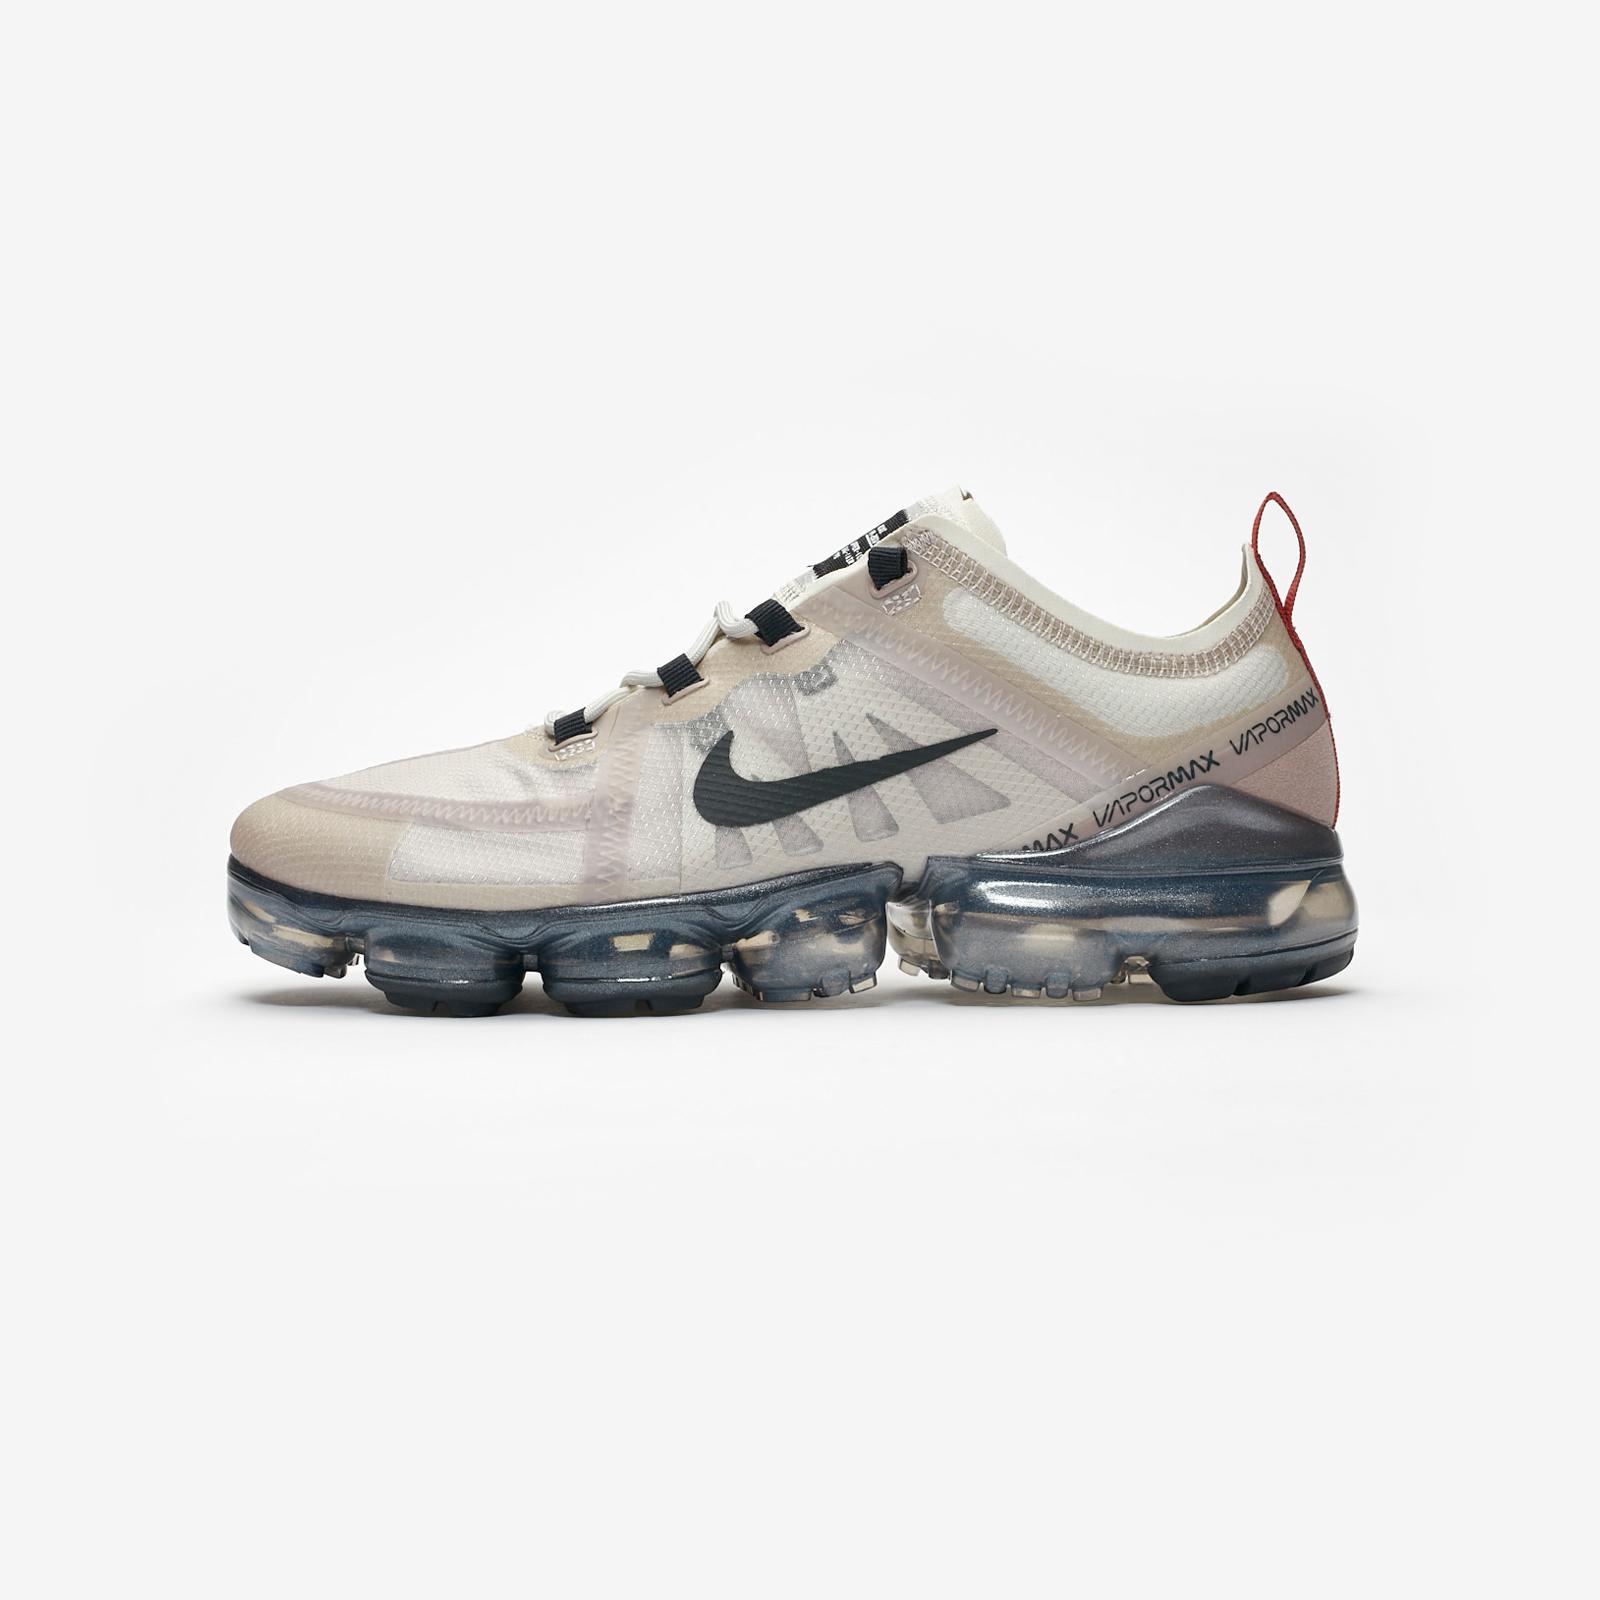 Nike Schuhe Air Vapormax 2019, AR6631200, Größe: 45 | real